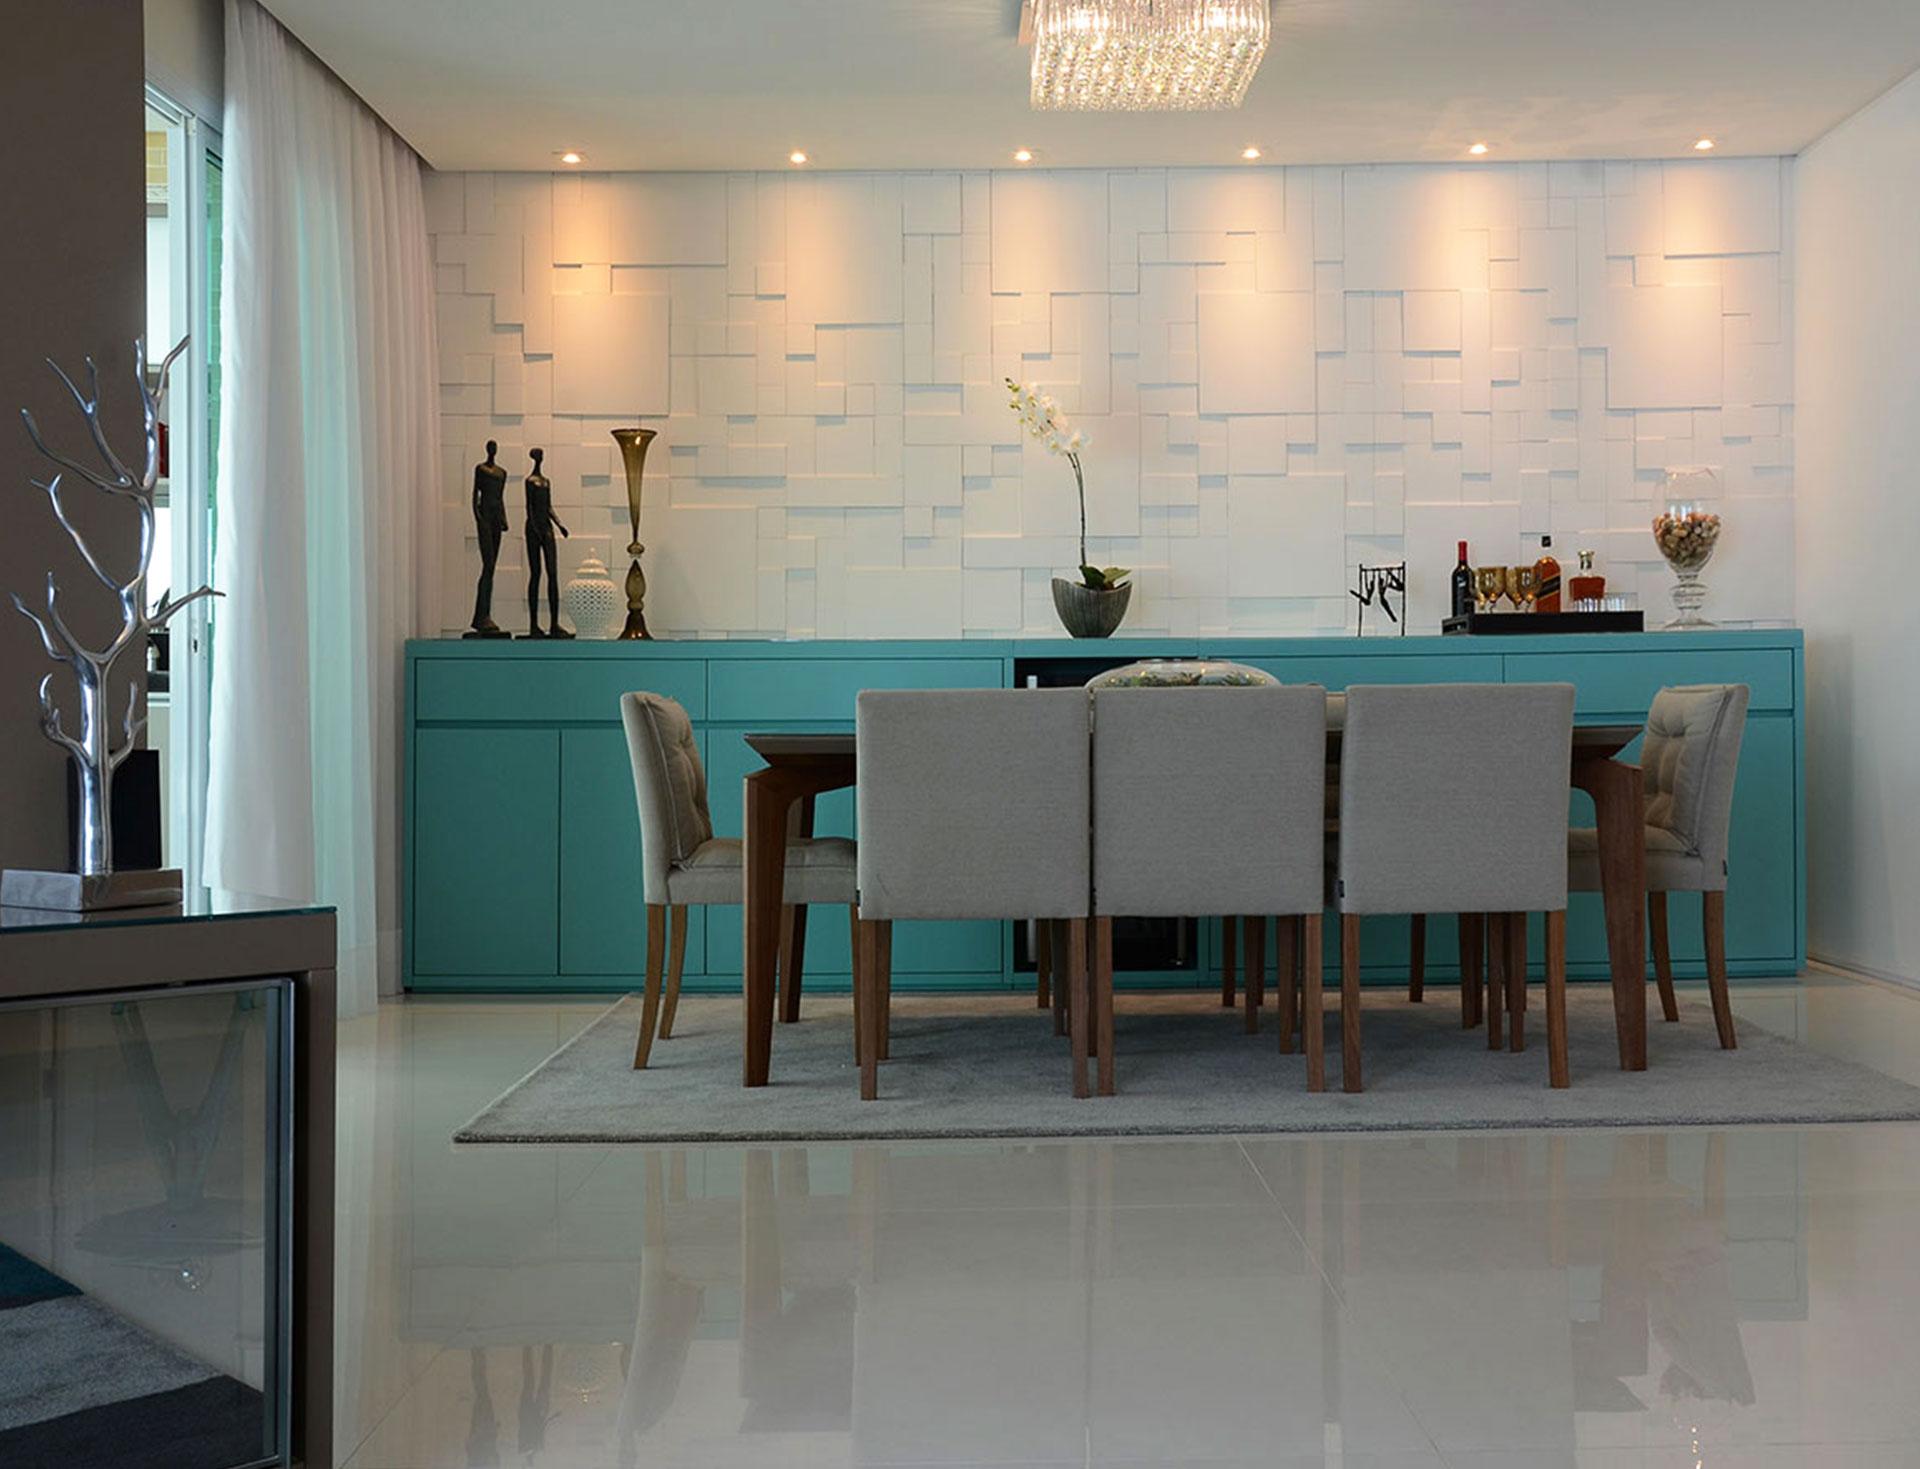 portfolio-cynthia-rolnik-apartamento1-08